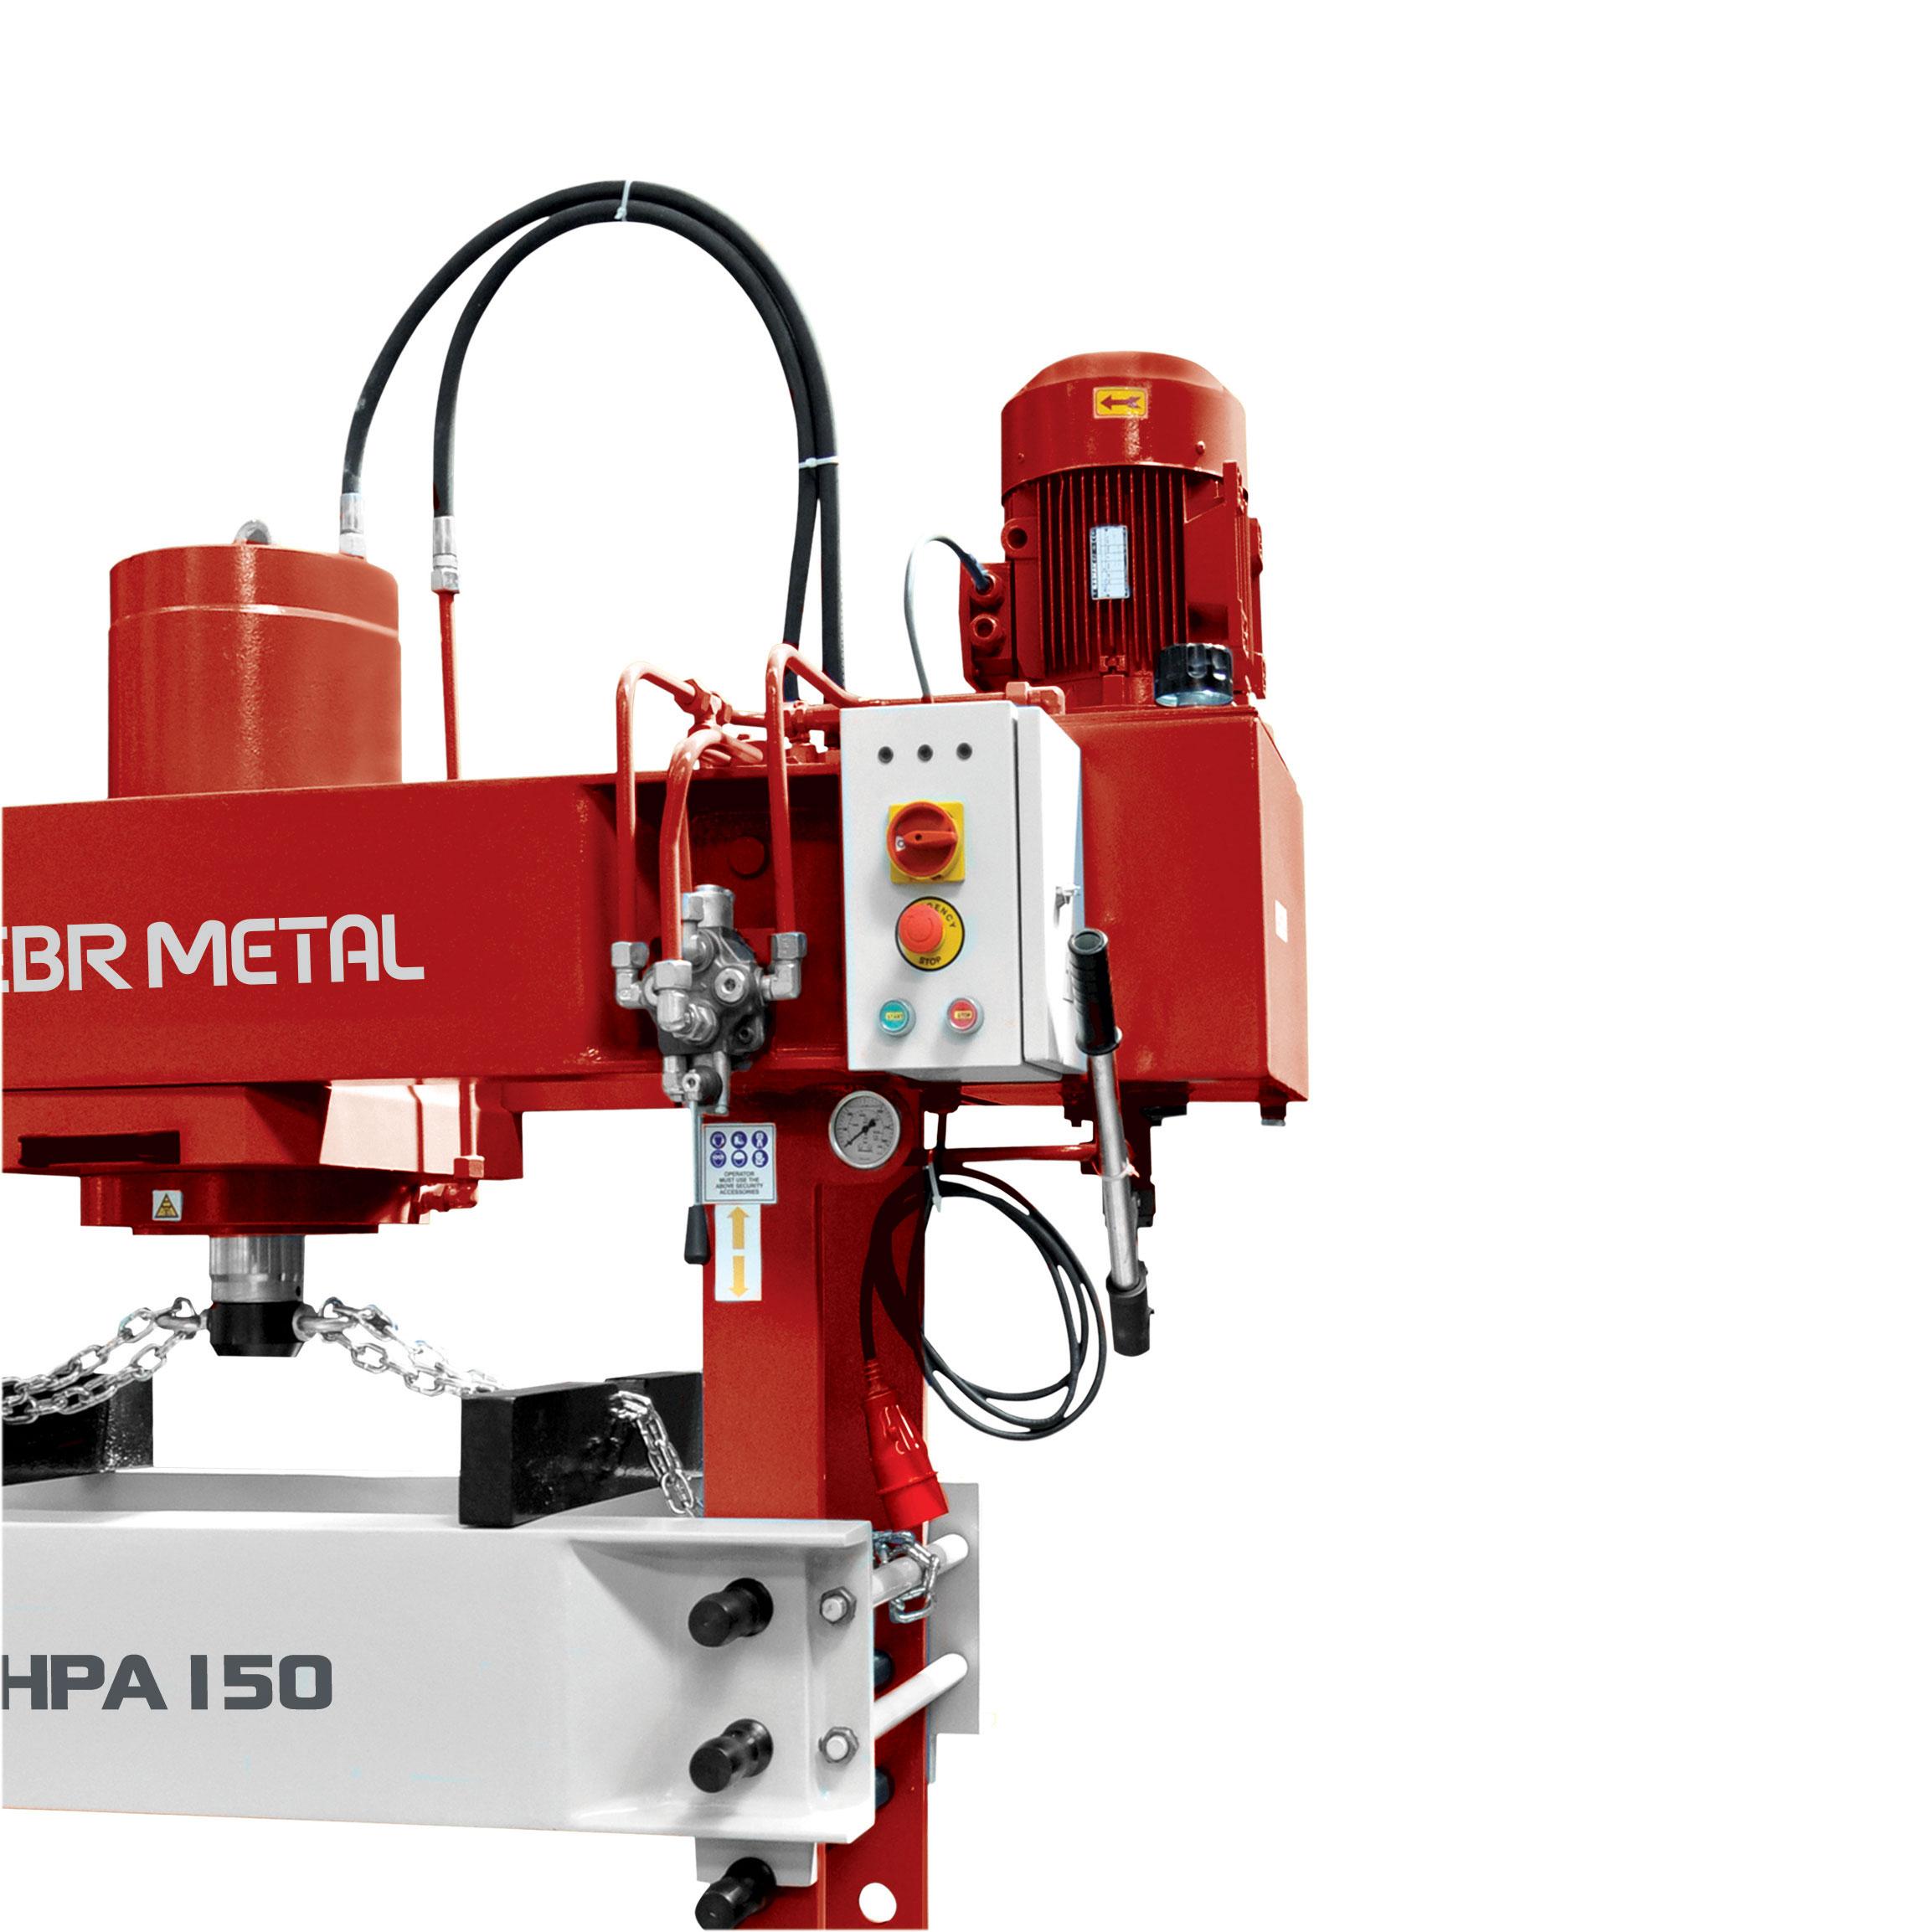 Hydraulic Workshop Press HPA 150 Detail